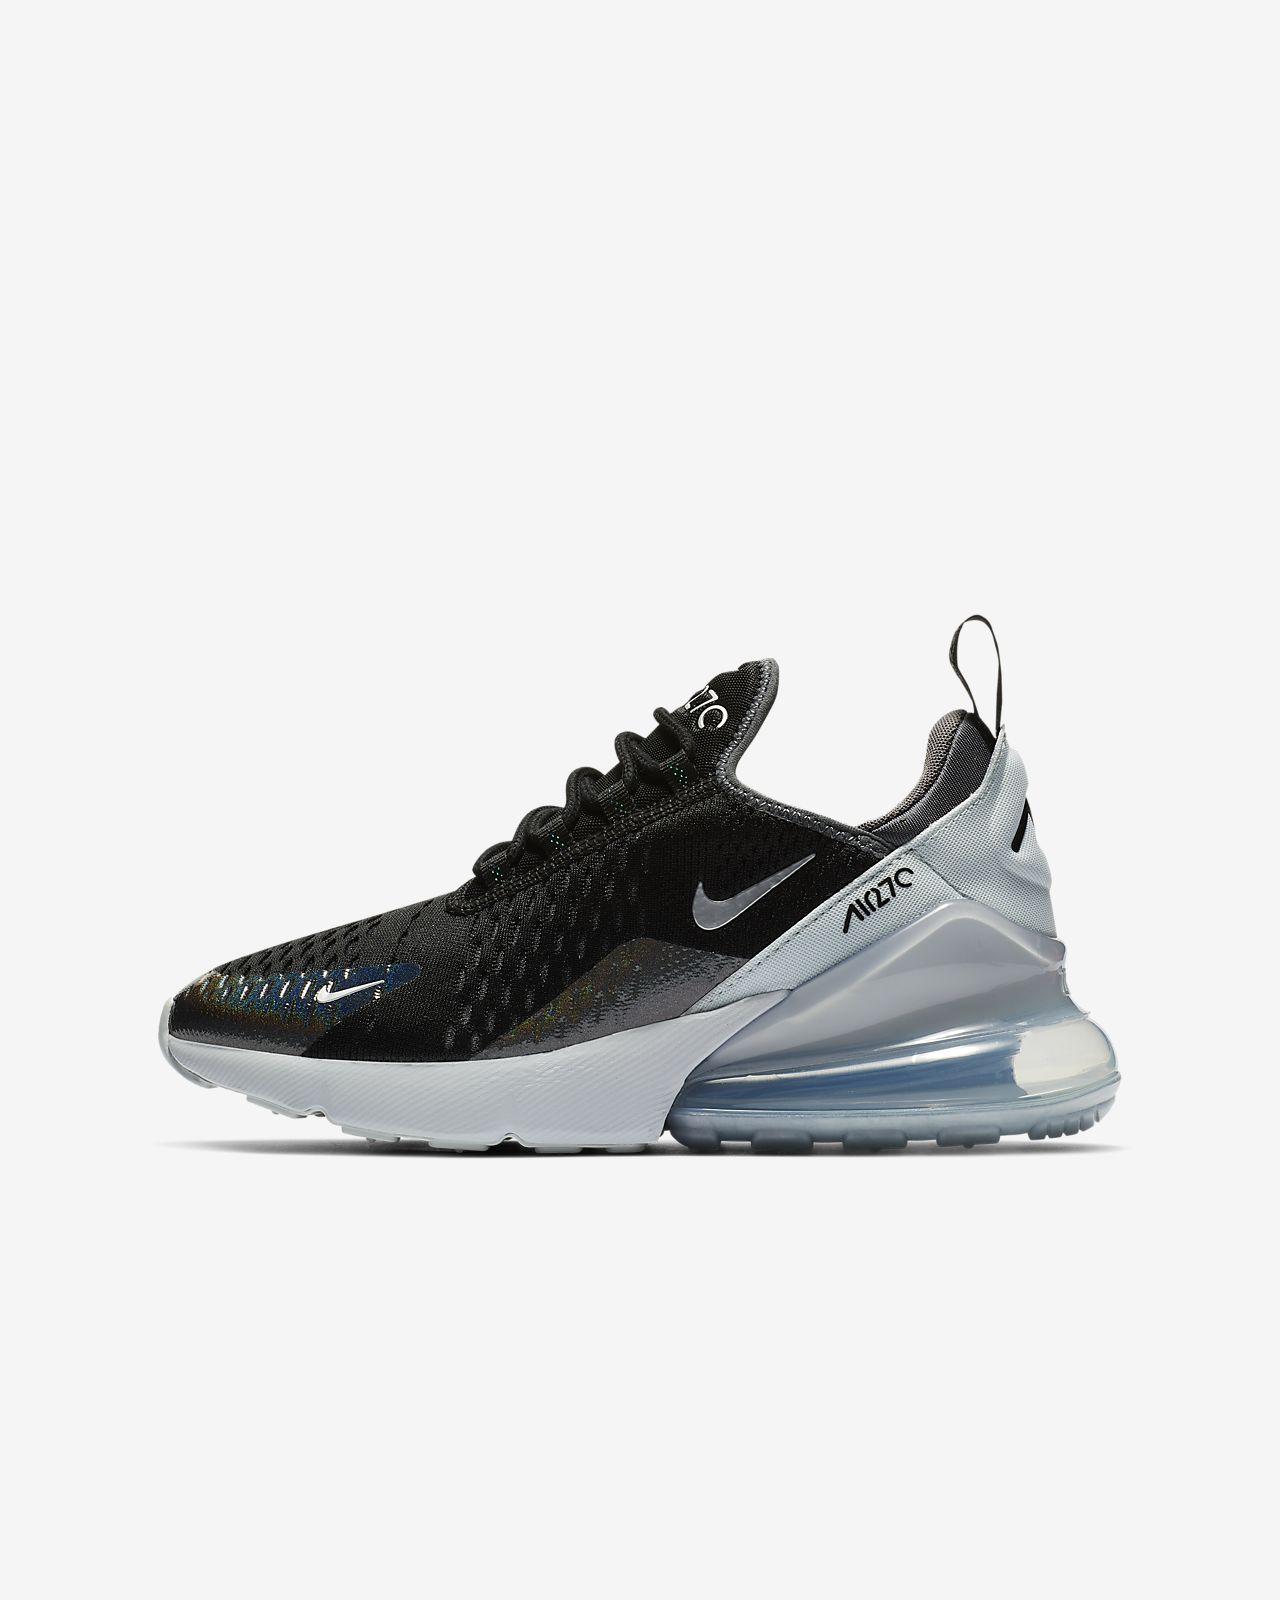 designer fashion edd44 132c9 ... Nike Air Max 270 Y2K Zapatillas - Niñoa